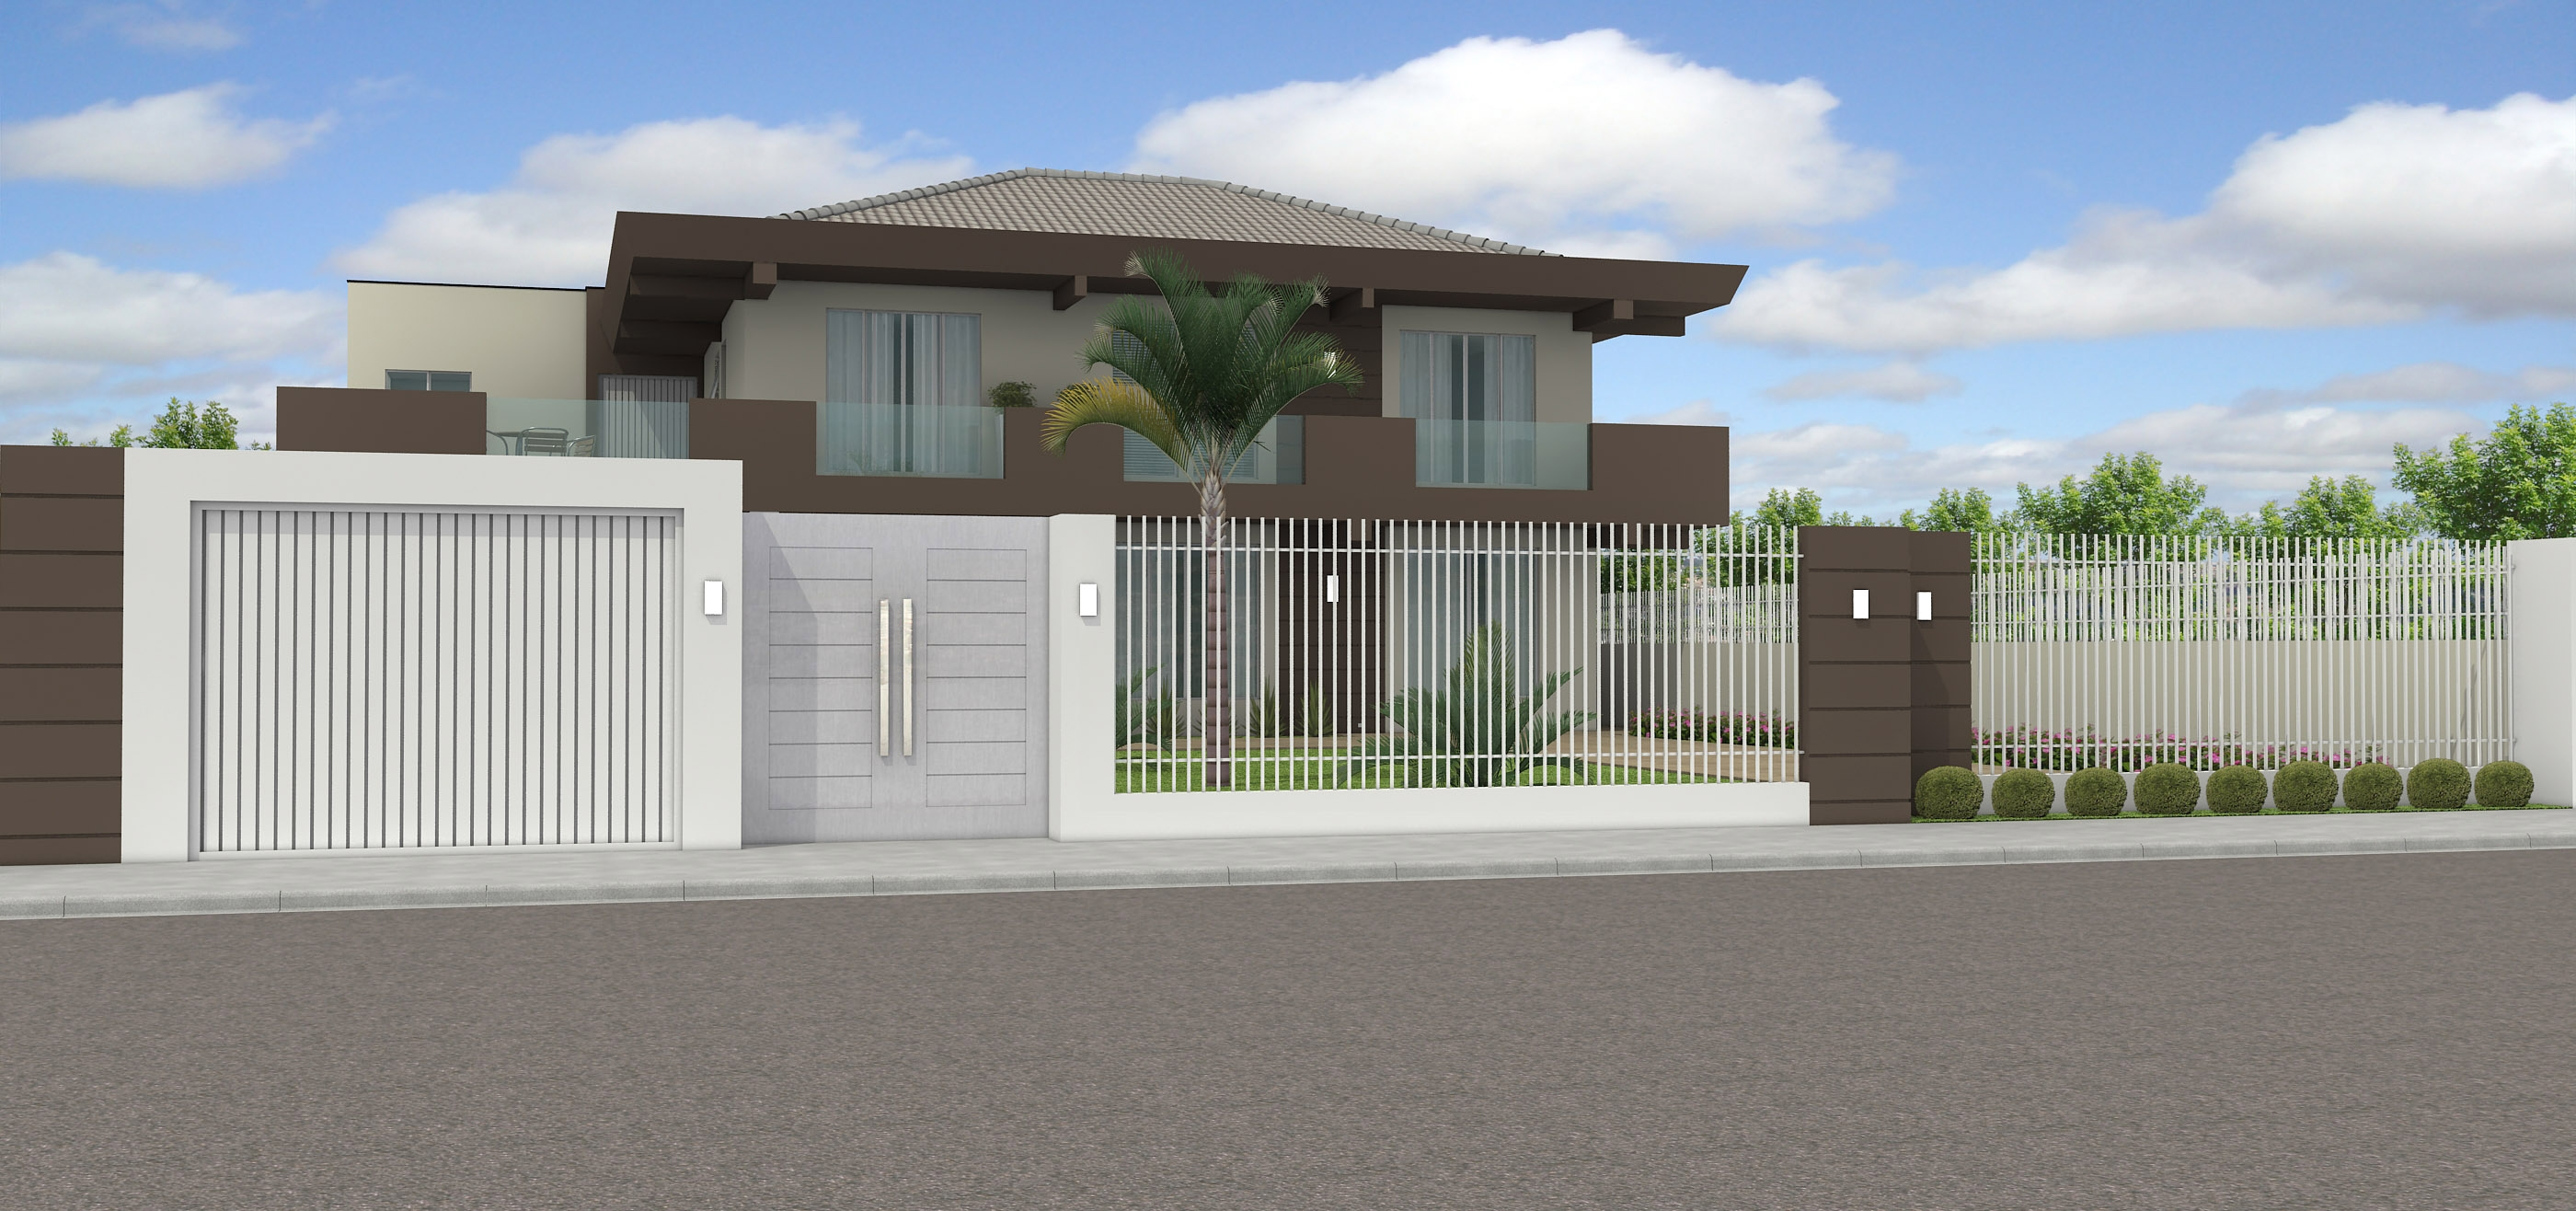 Port es de casas modernas 13 modelos para inspirar for Modelos de techos metalicos para casas